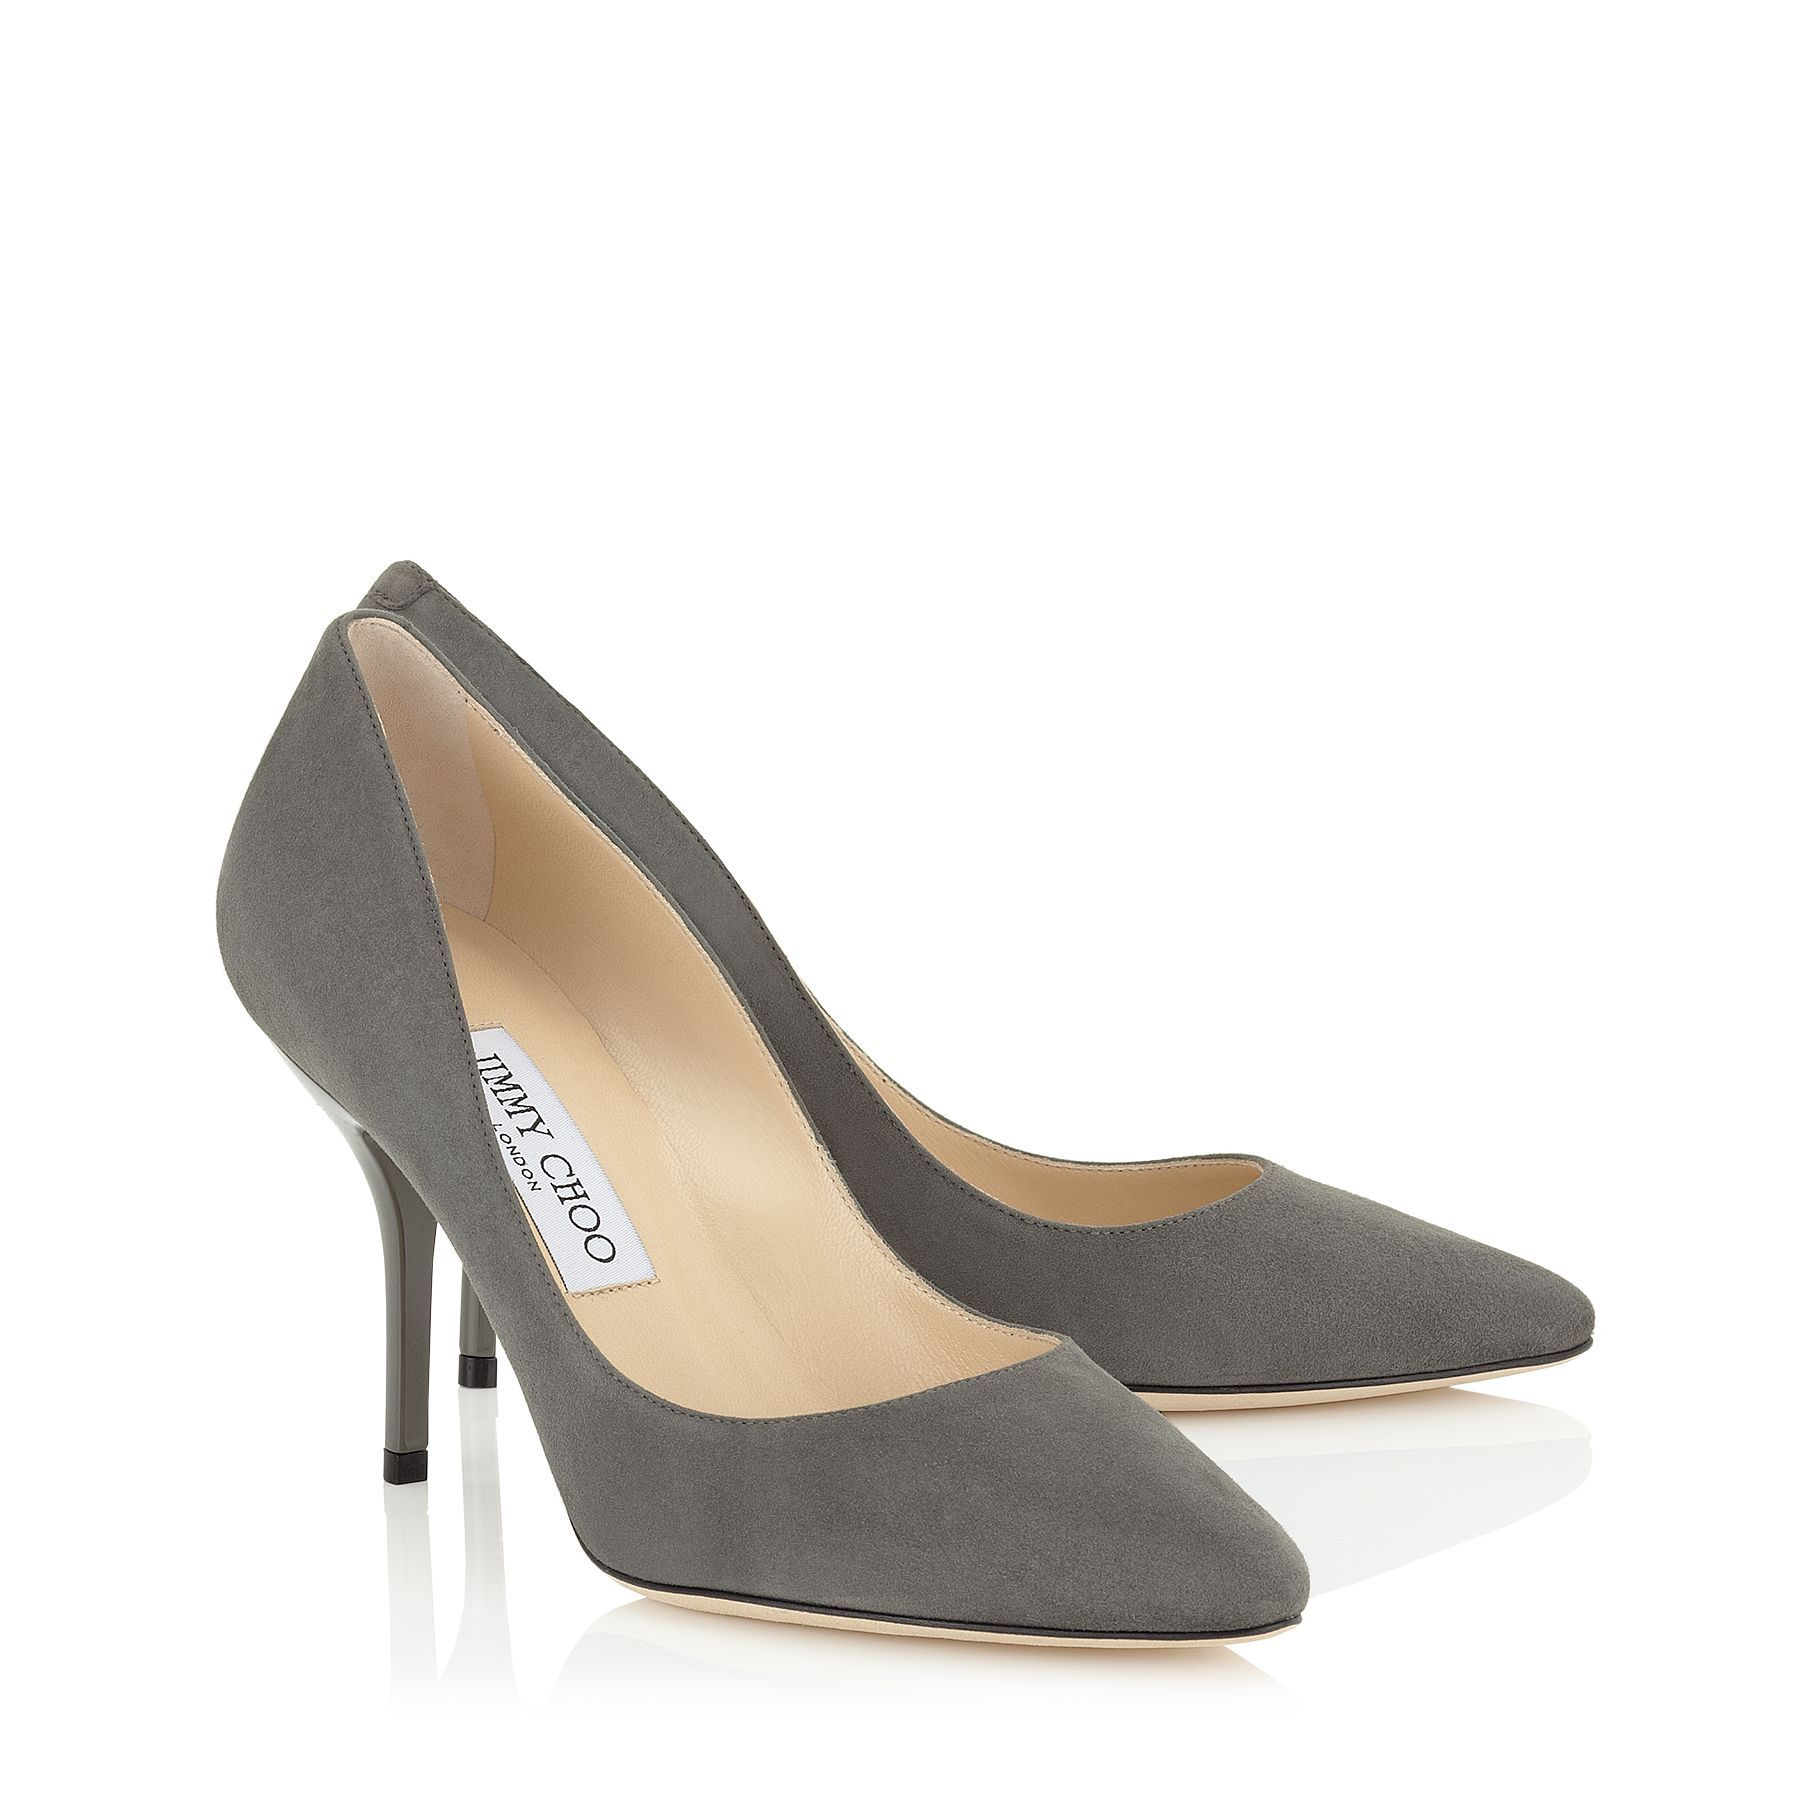 Twilight Suede Almond Toe Pumps | Mei | Spring Summer 15 | JIMMY CHOO Shoes